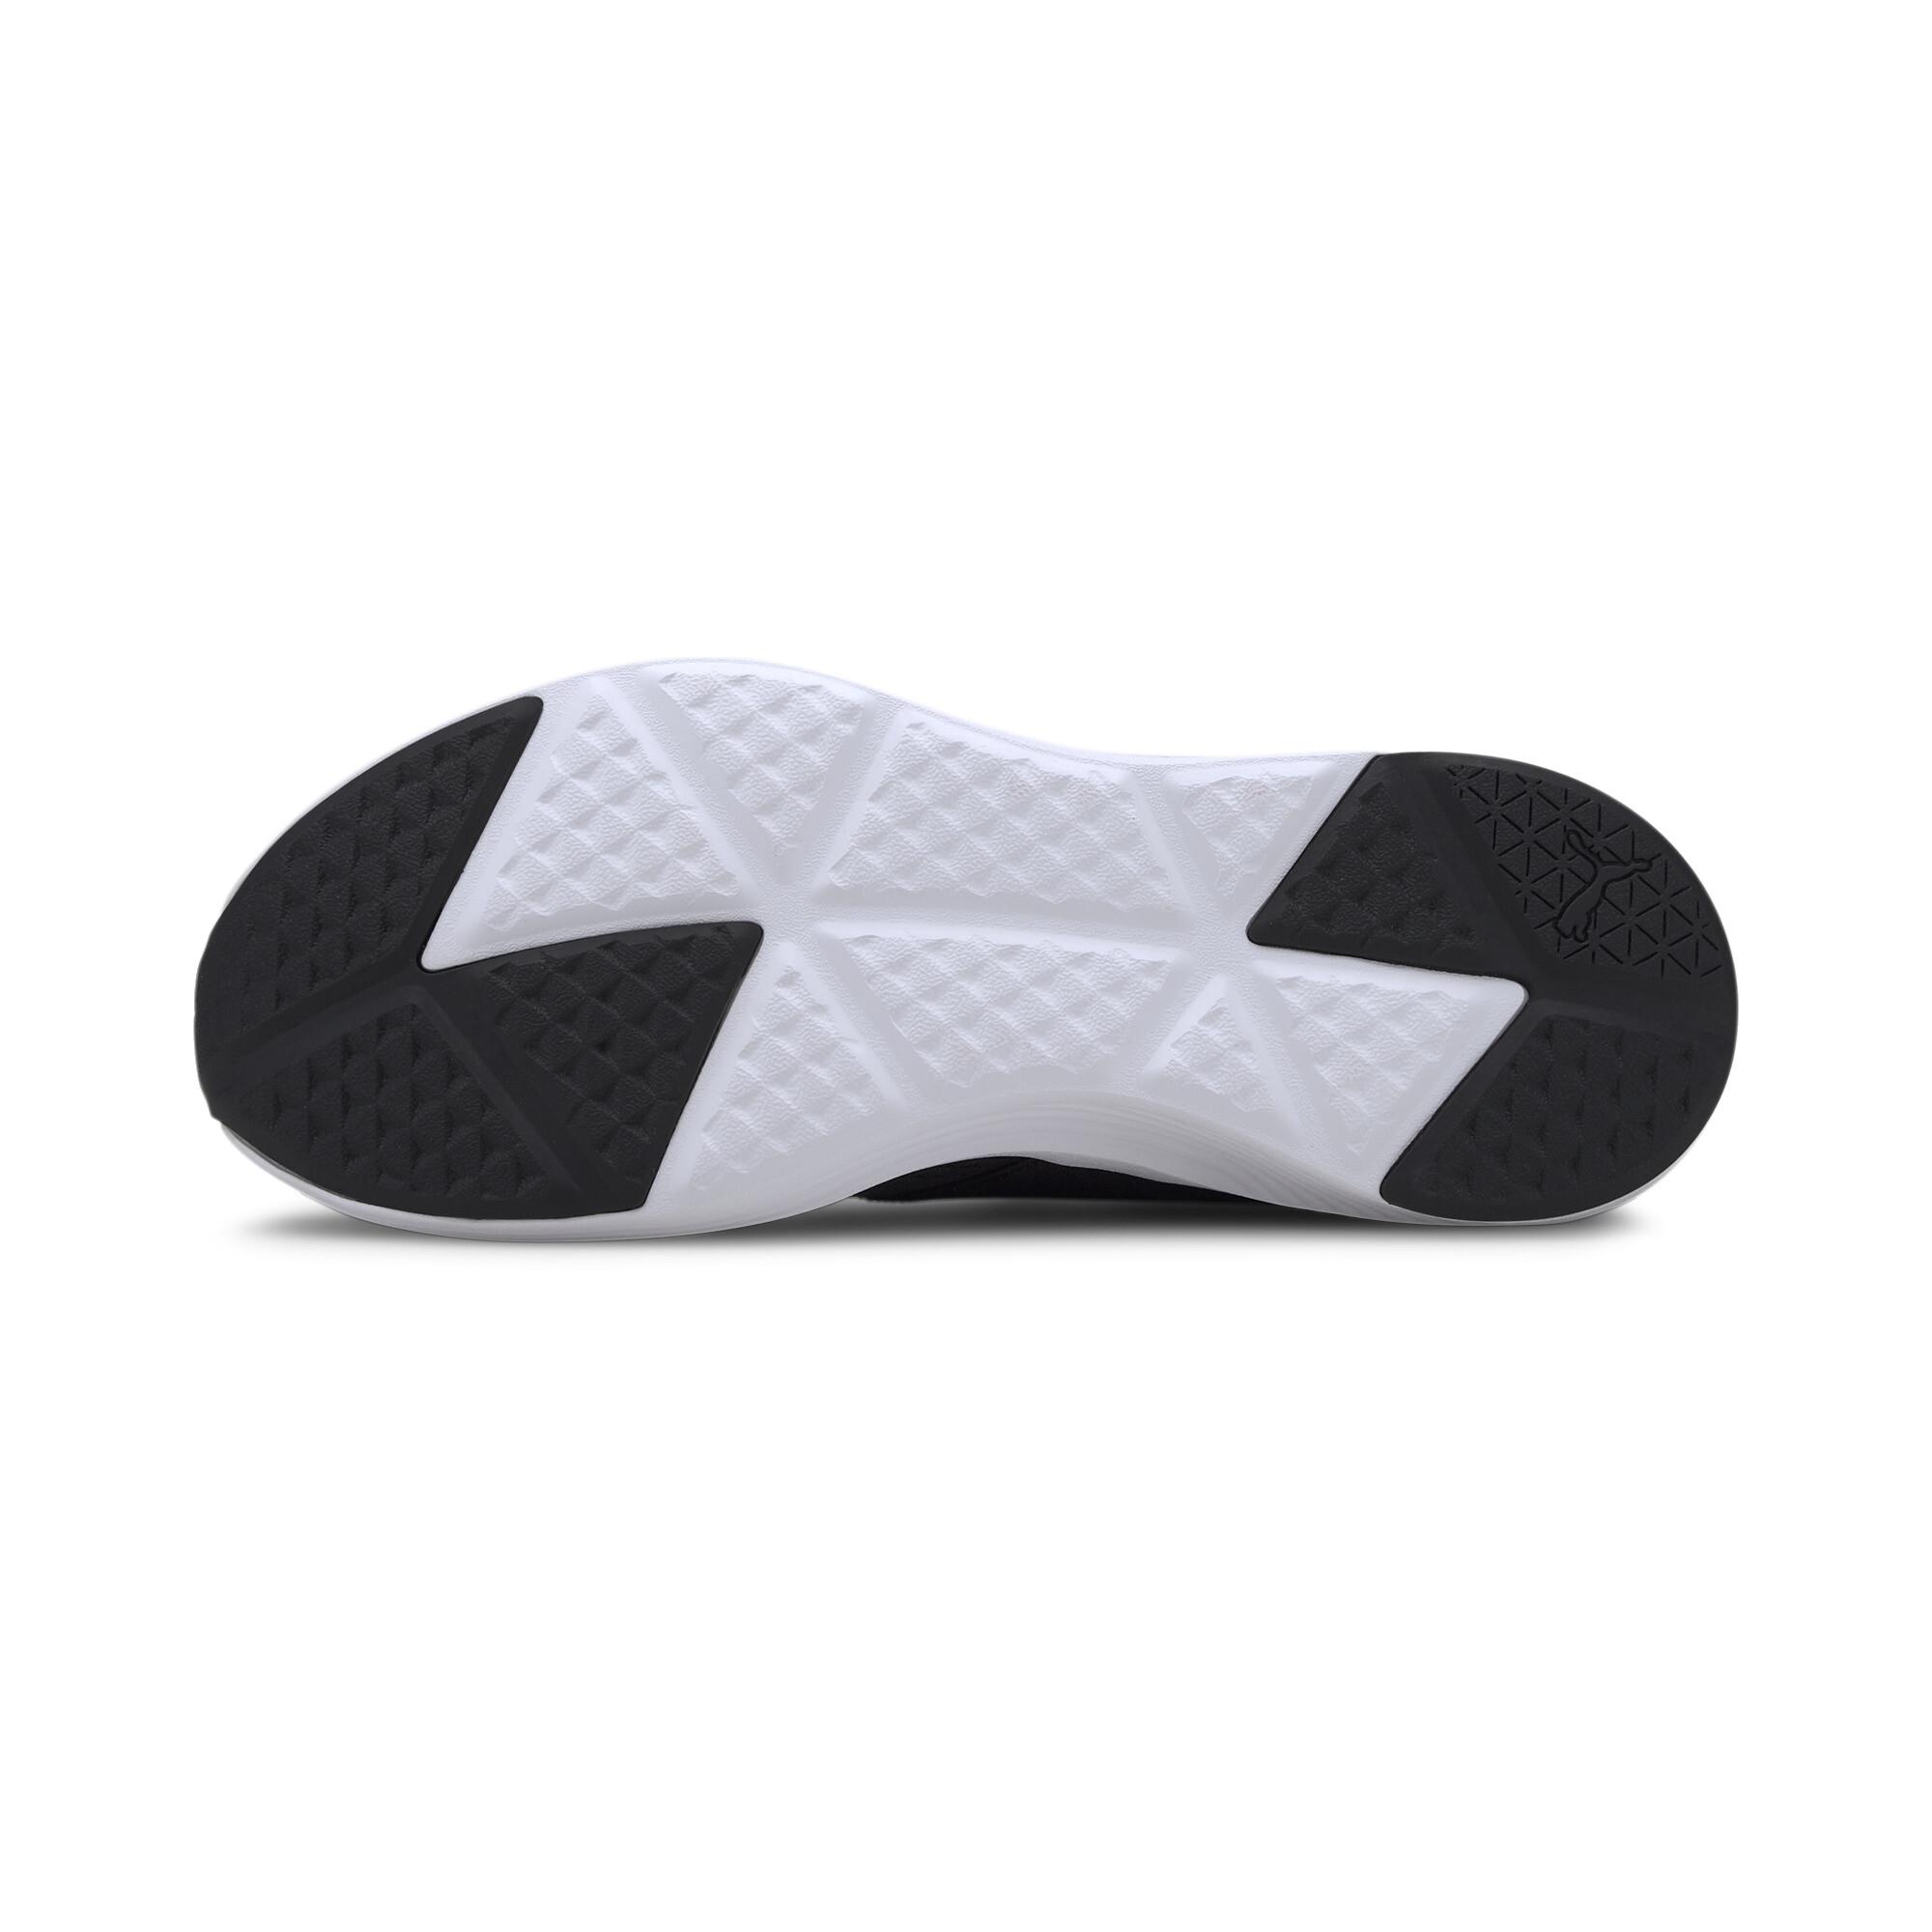 thumbnail 16 - PUMA Women's Prowl Slip On Training Shoes